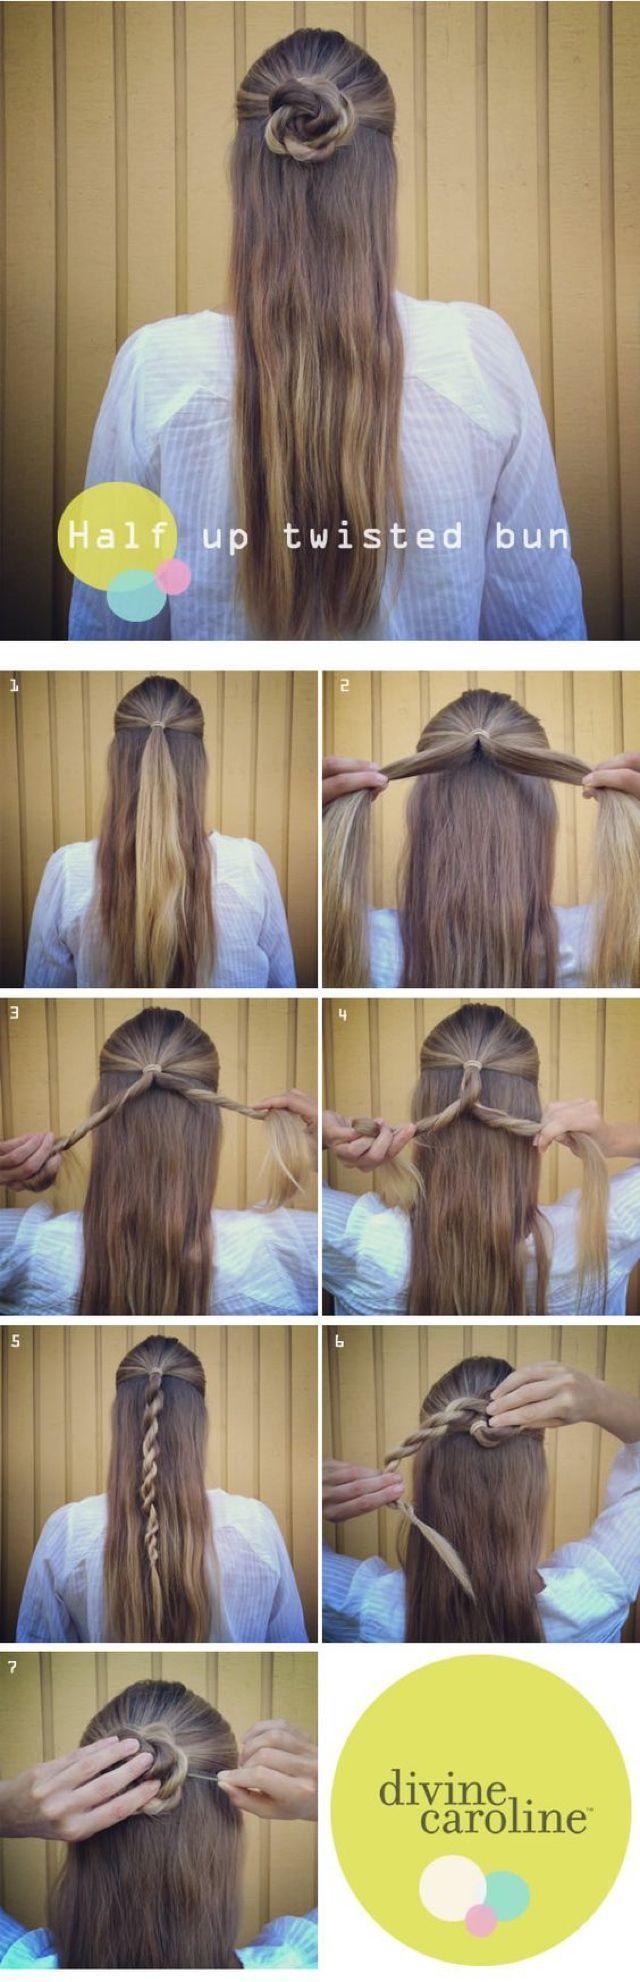 Easy Hairstyles Ideas Rose braid flower bun (Video) #braid #Bun #easy #flower #hairstyle # ...